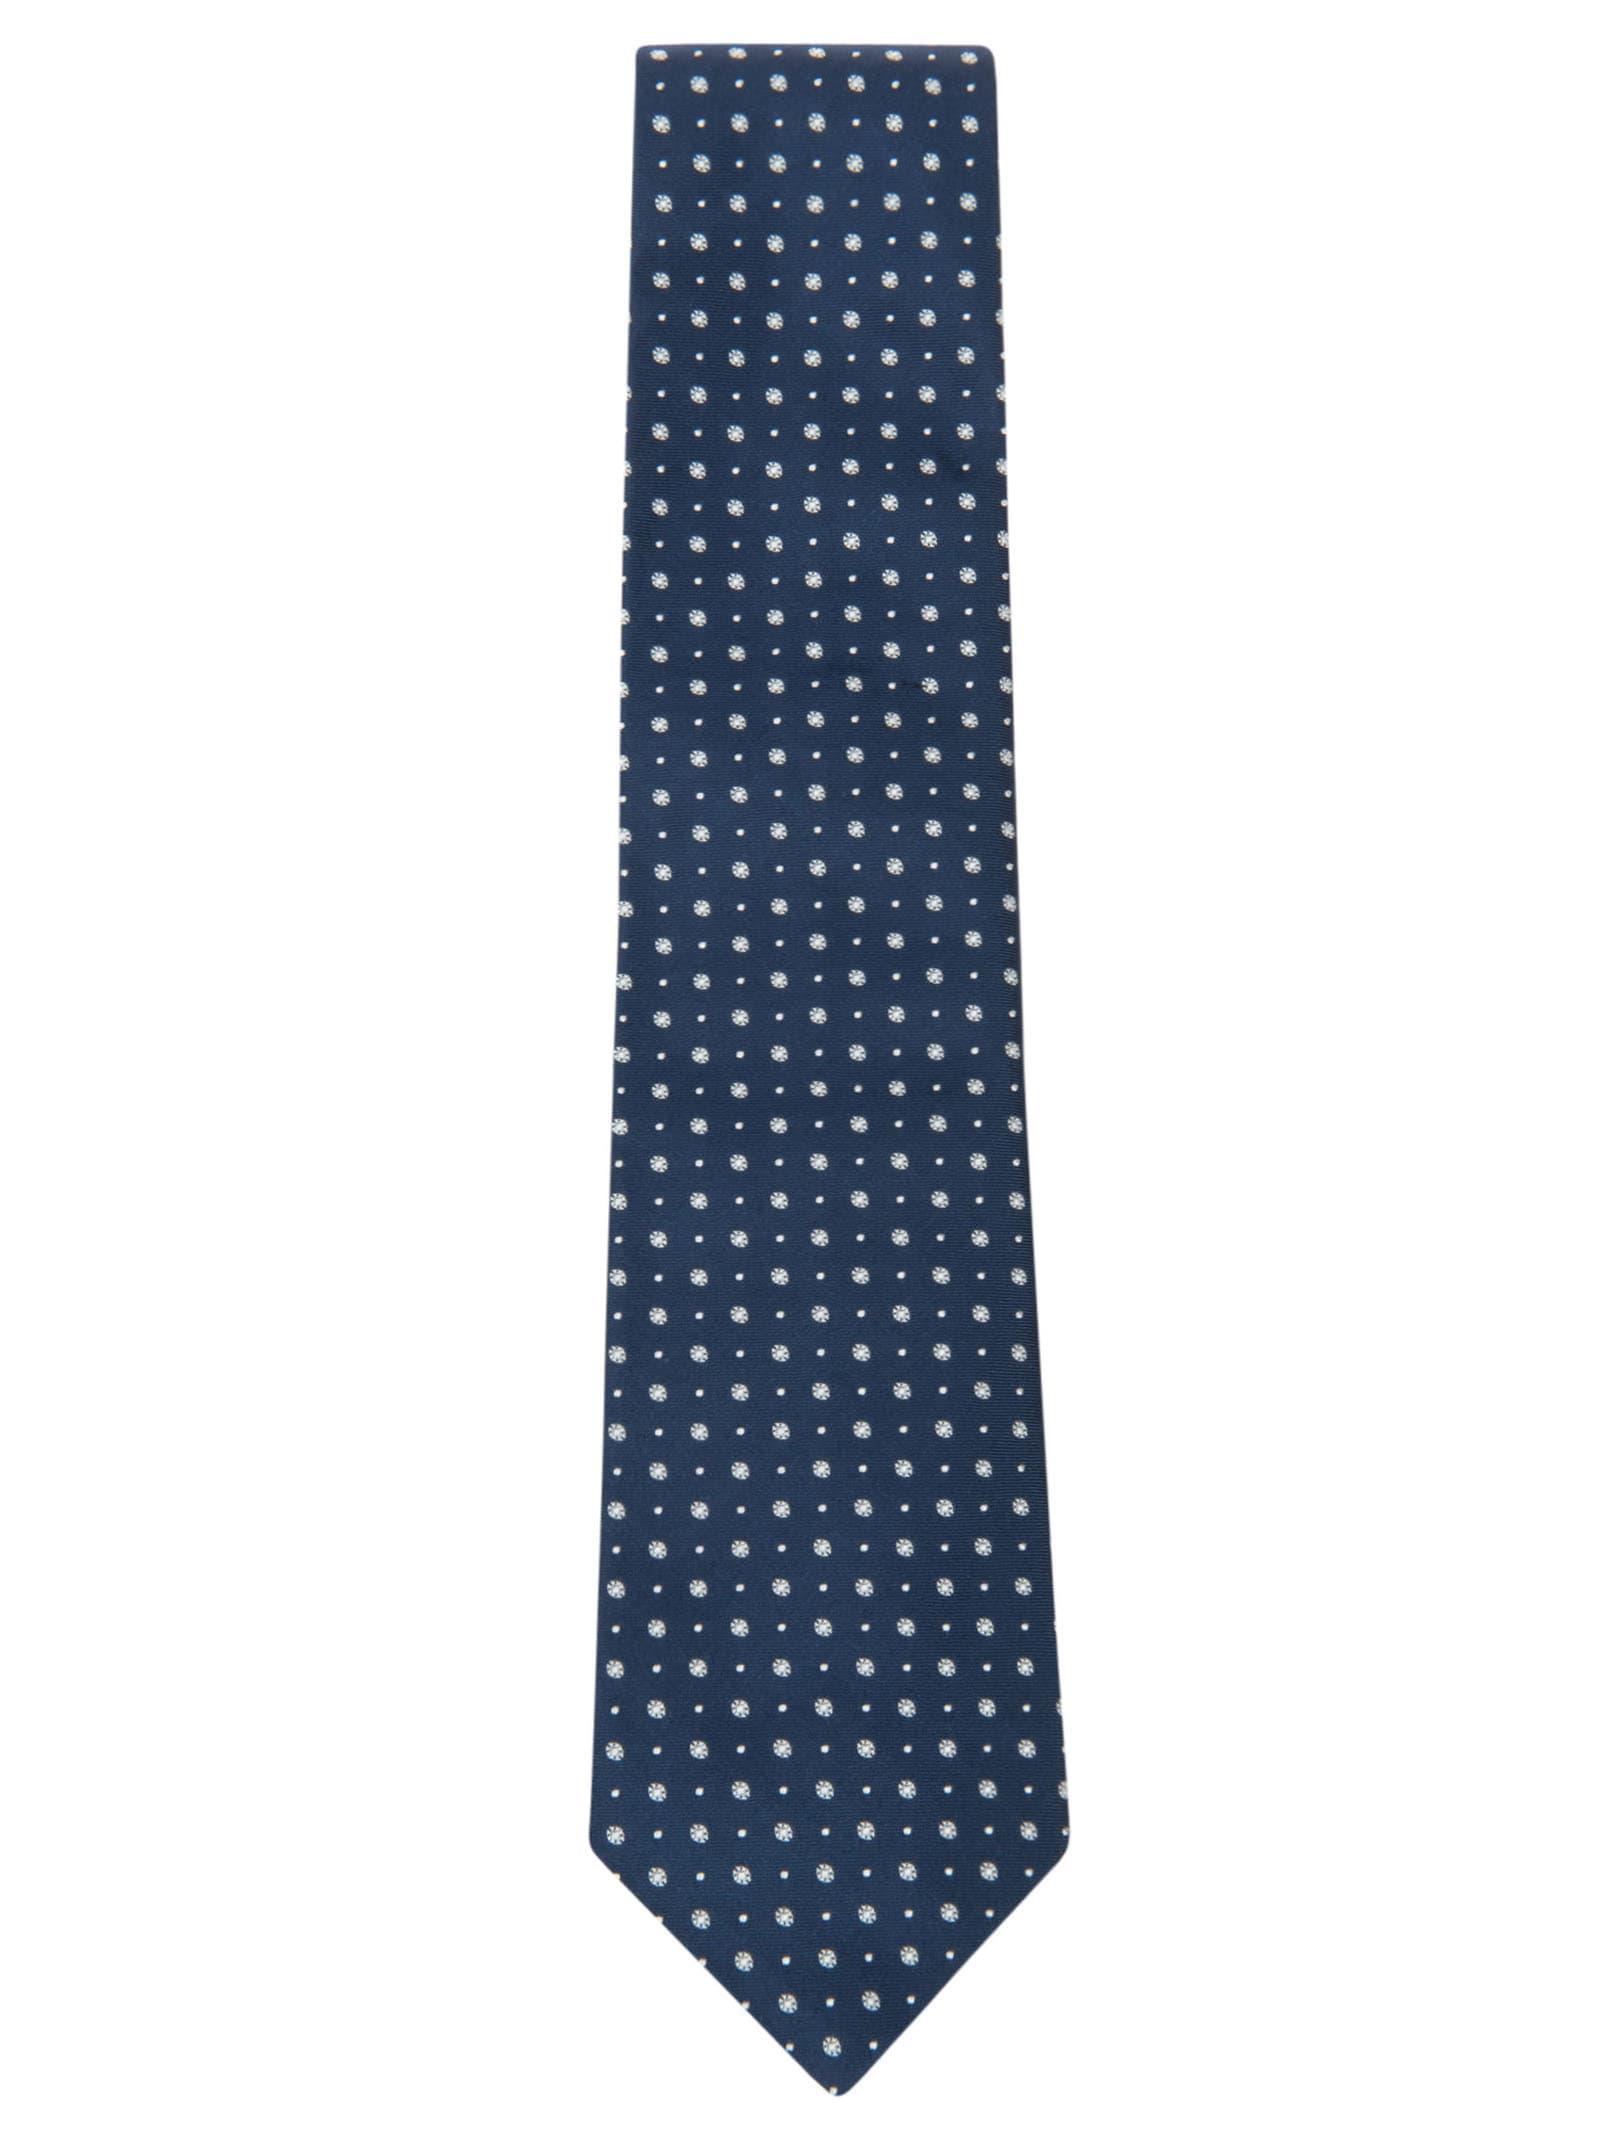 Motif Print Neck Tie